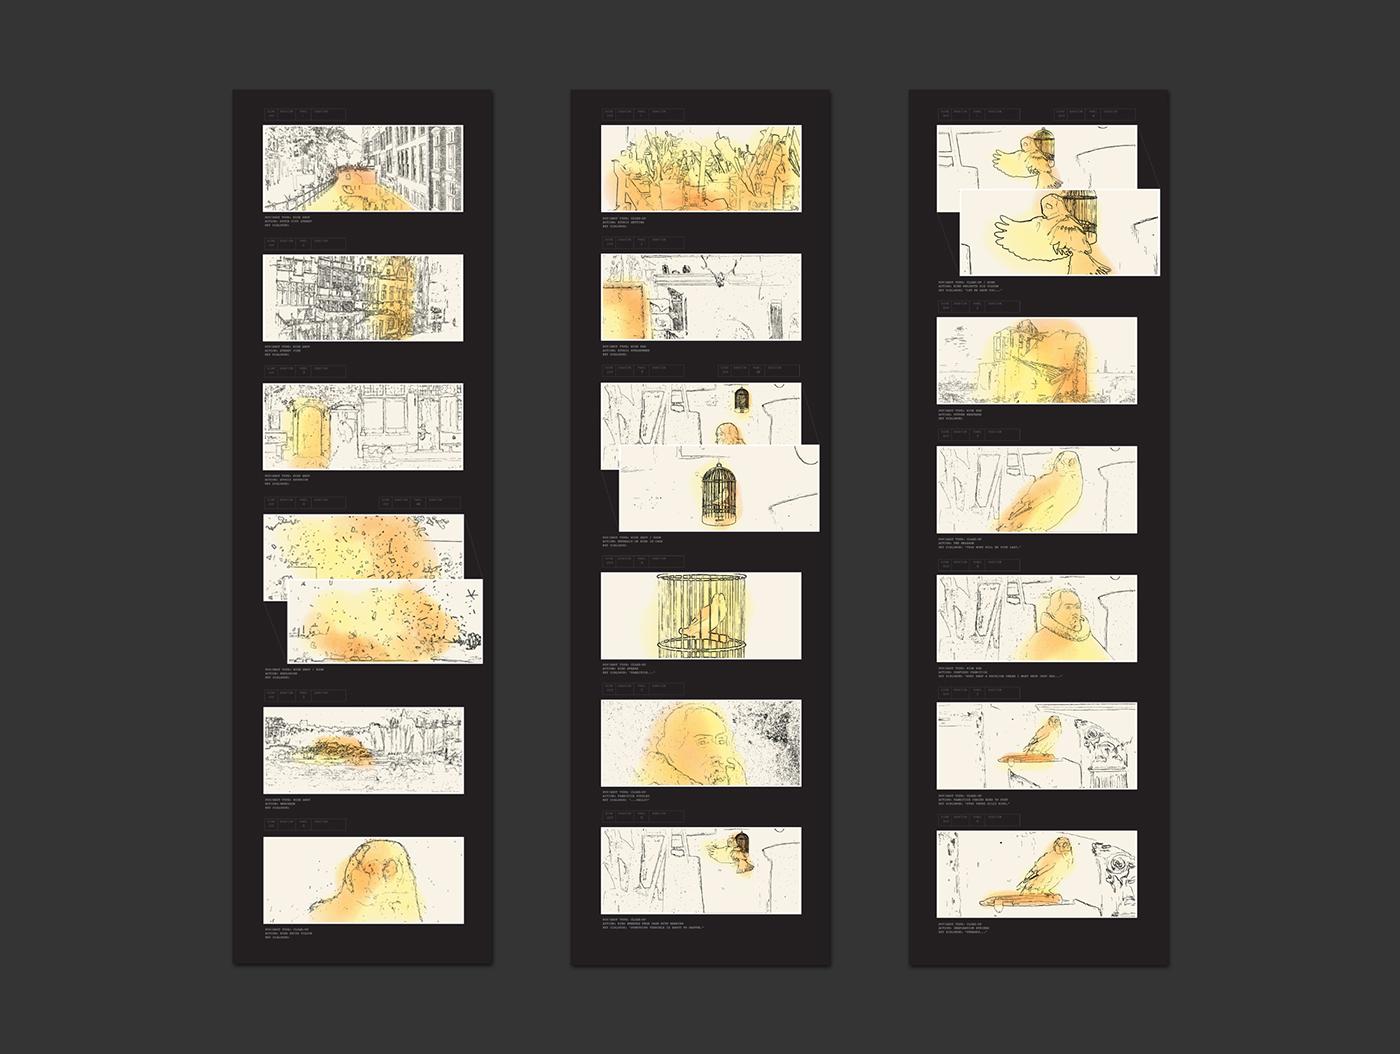 comic comic strip Film   storyboard Film strip historical fiction historical history